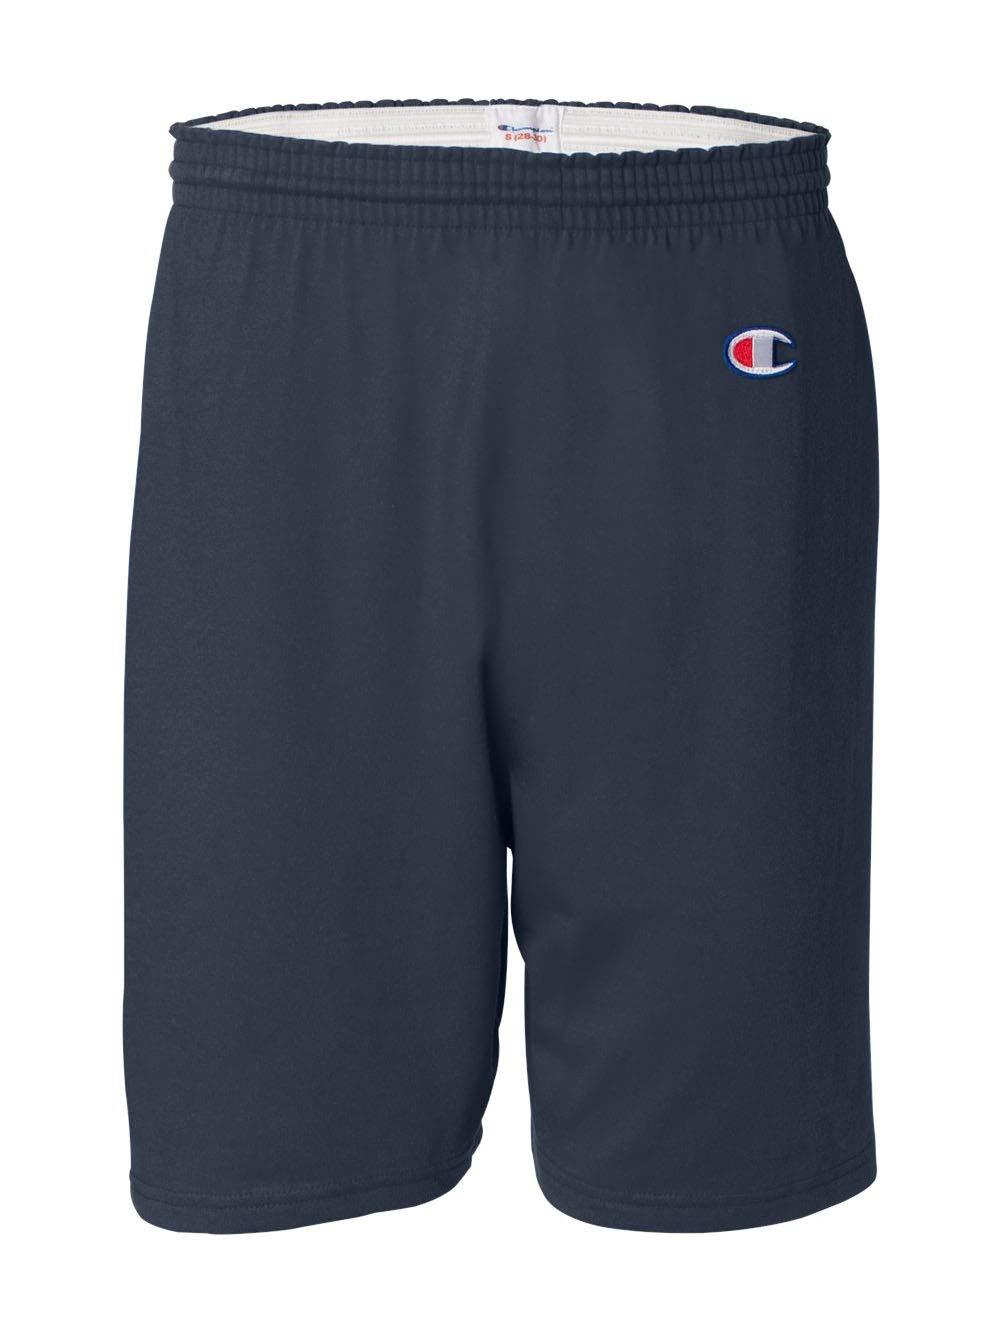 Champion Men's  6-Inch Navy   Cotton Jersey Shorts - XX-Large